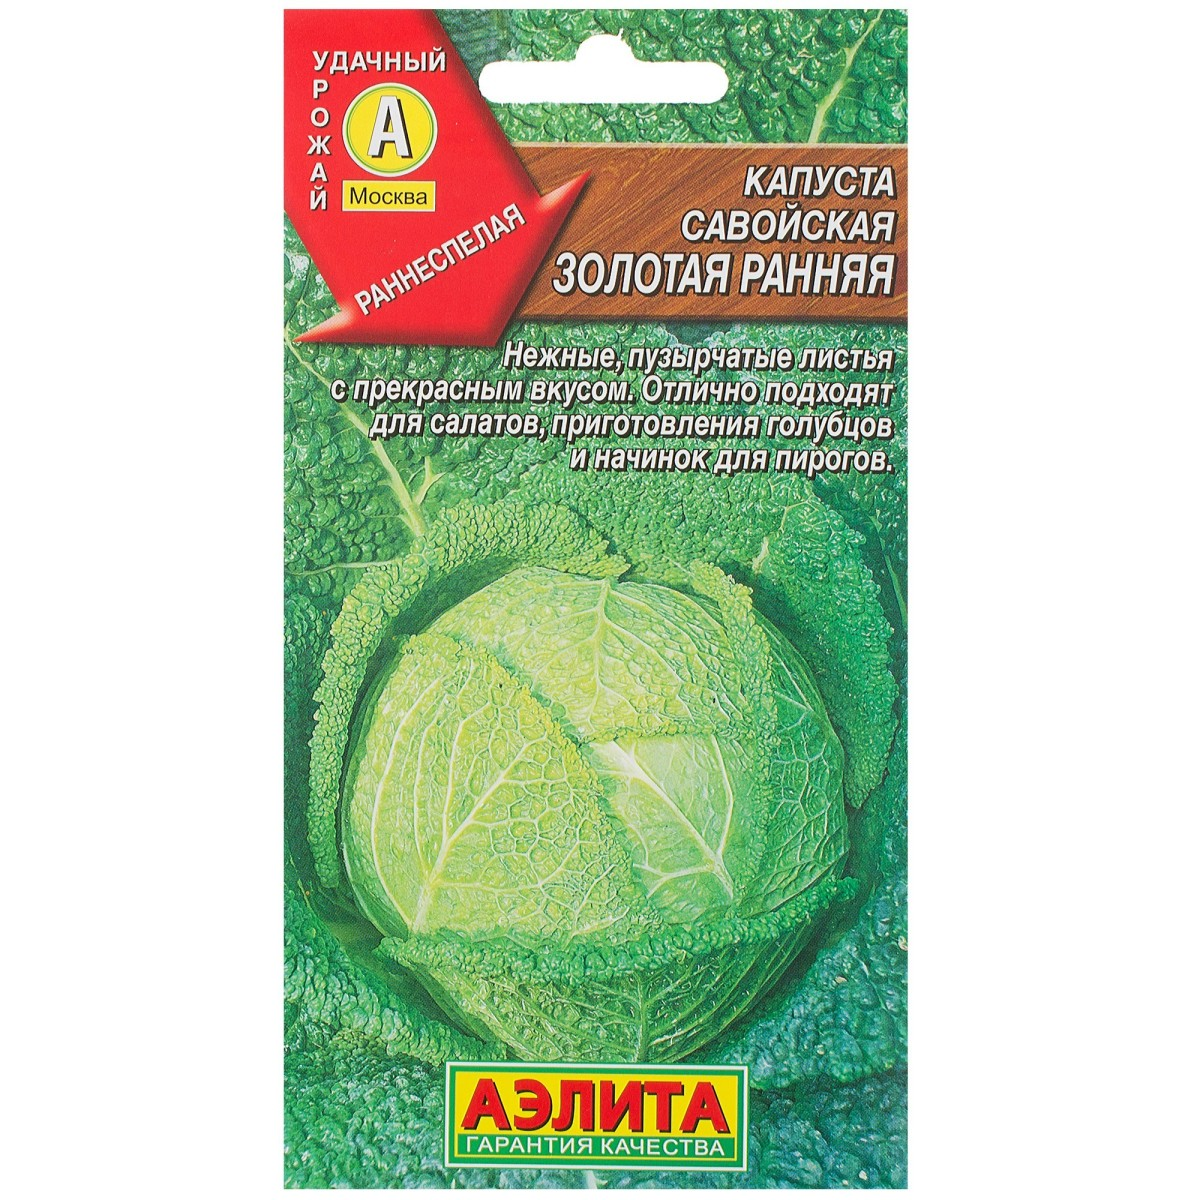 Семена Капуста савойская Золотая ранняя 0.5 г